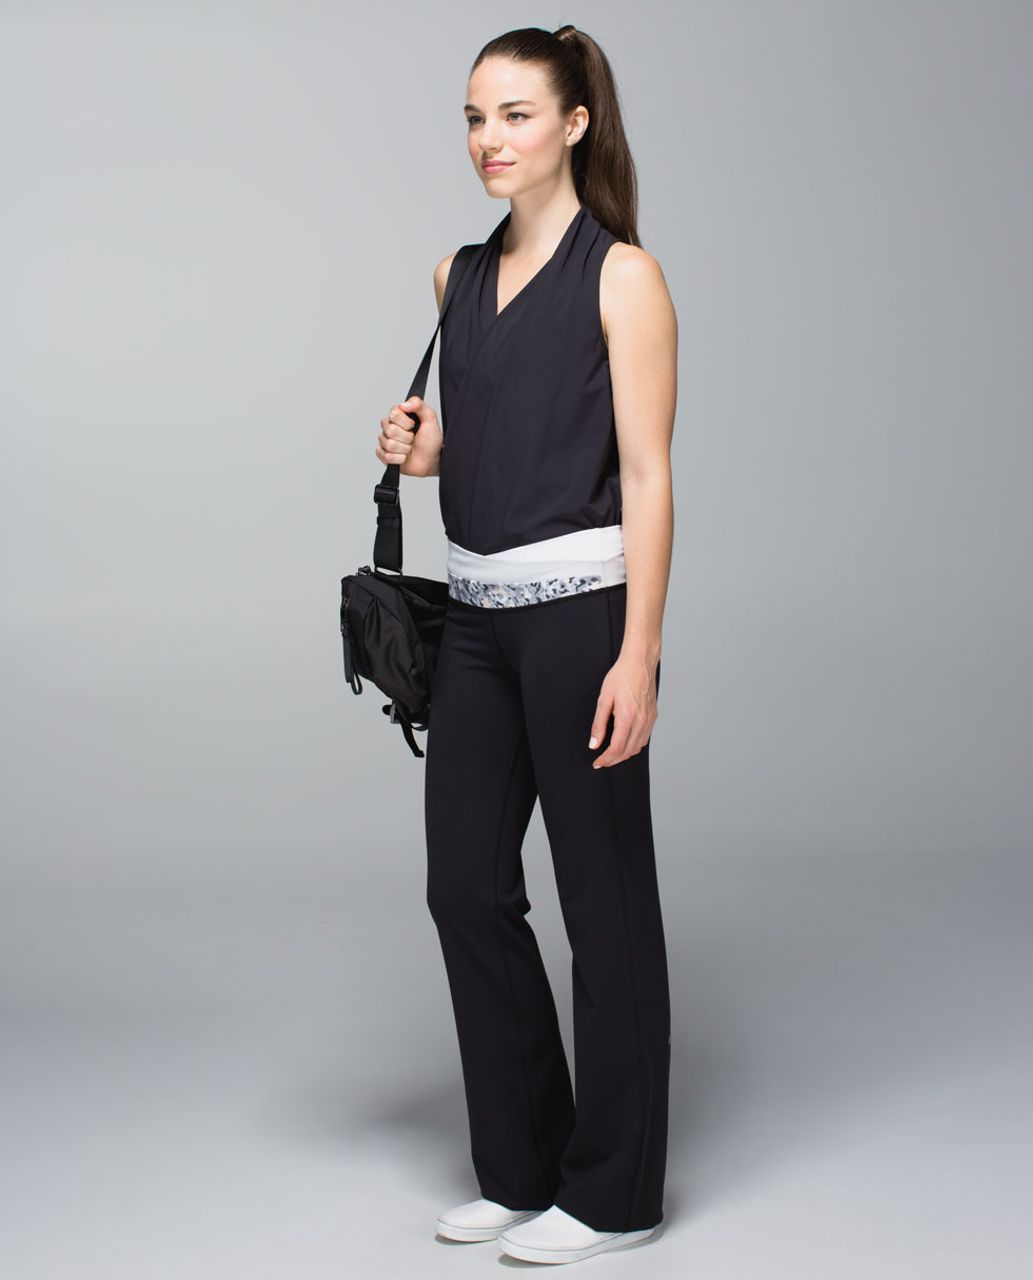 Lululemon Astro Pant (Regular) *Full-On Luon - Black / Not So Petite Fleur Silver Spoon / Silver Spoon / White